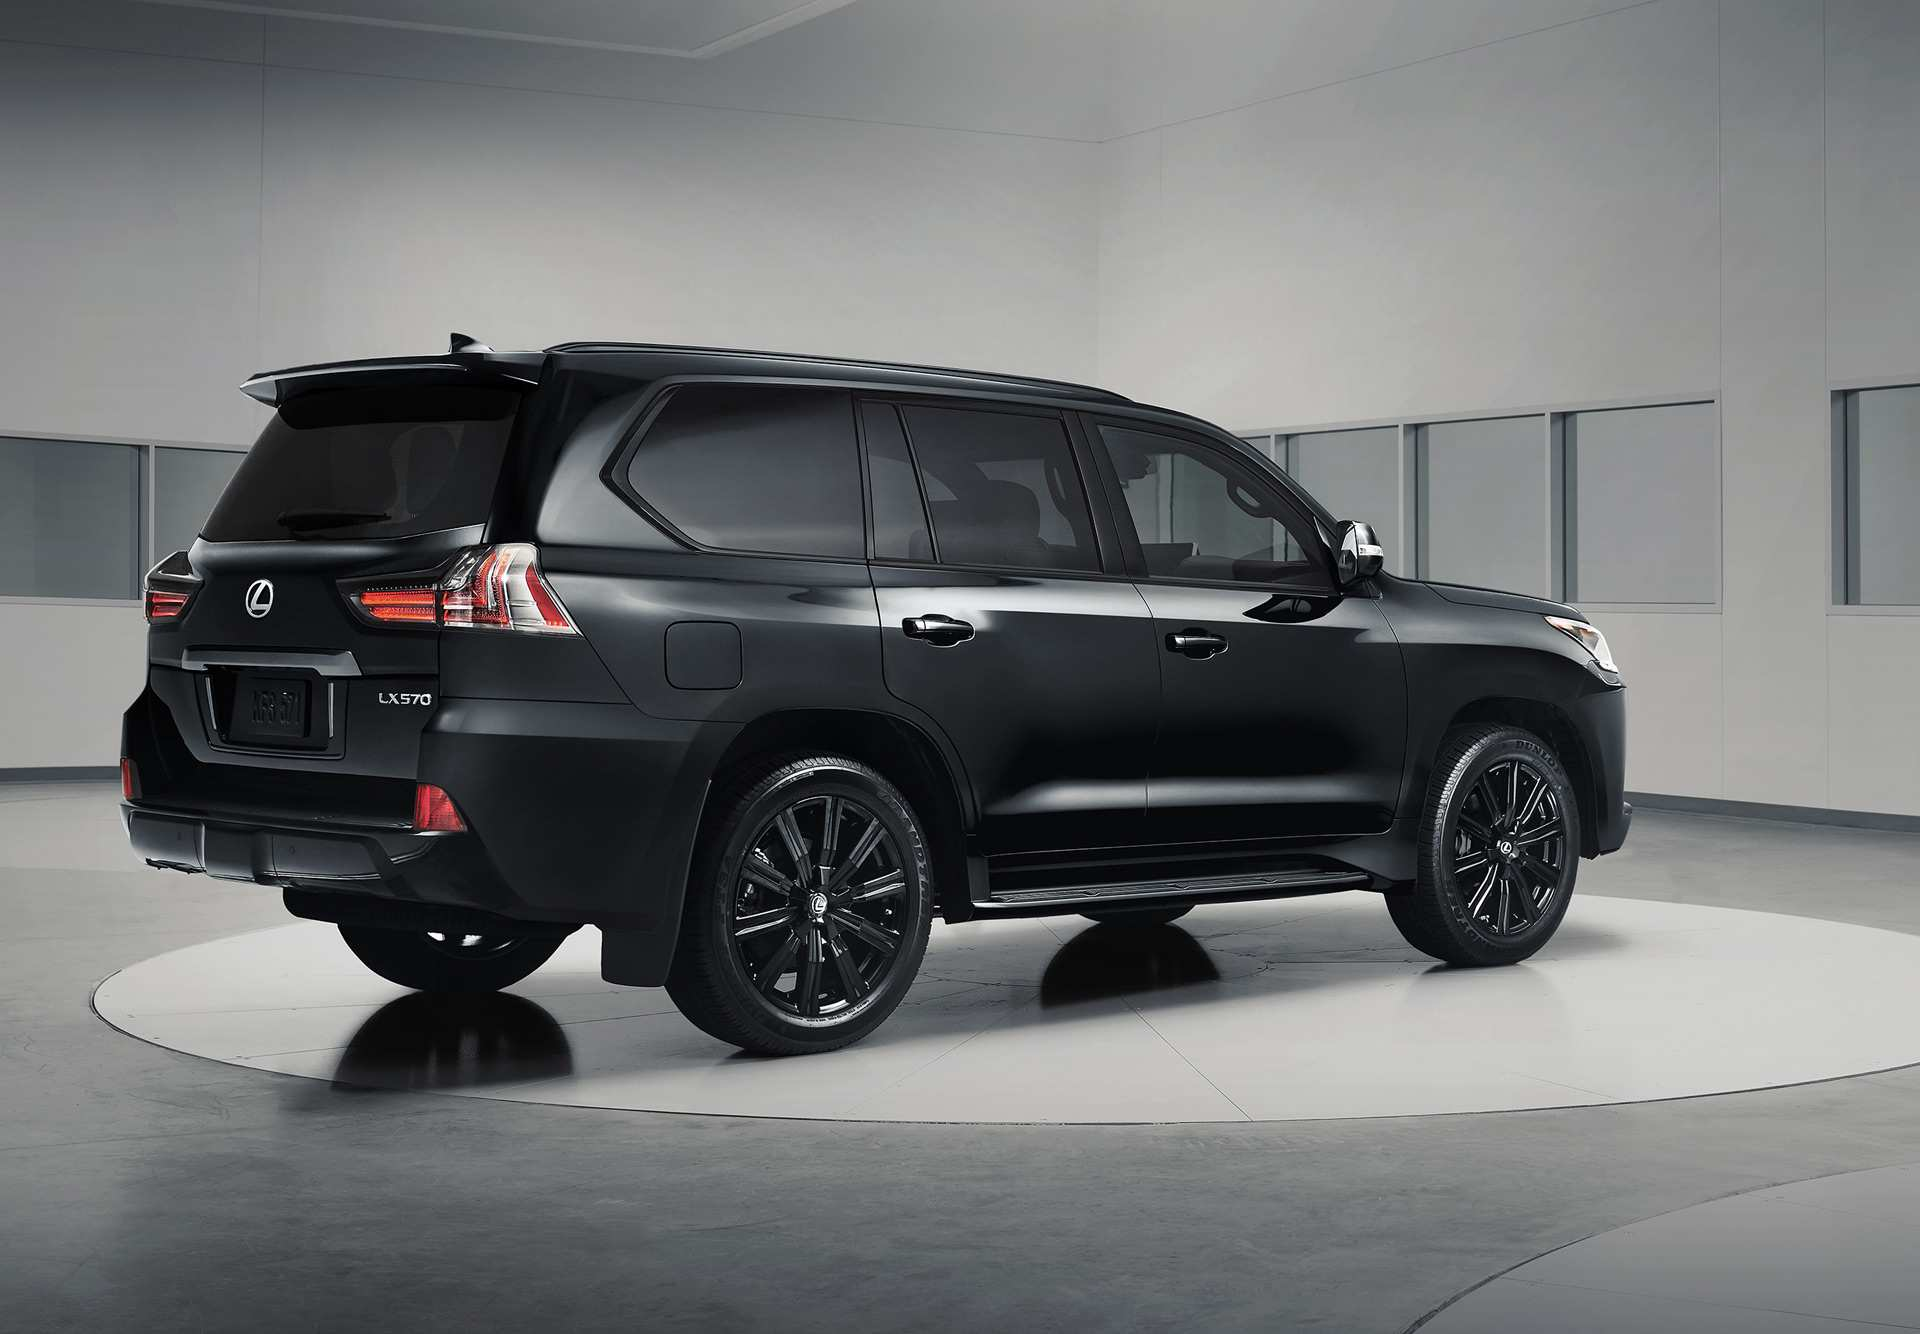 90 Concept of Lexus Lx 570 Black Edition 2020 Configurations by Lexus Lx 570 Black Edition 2020